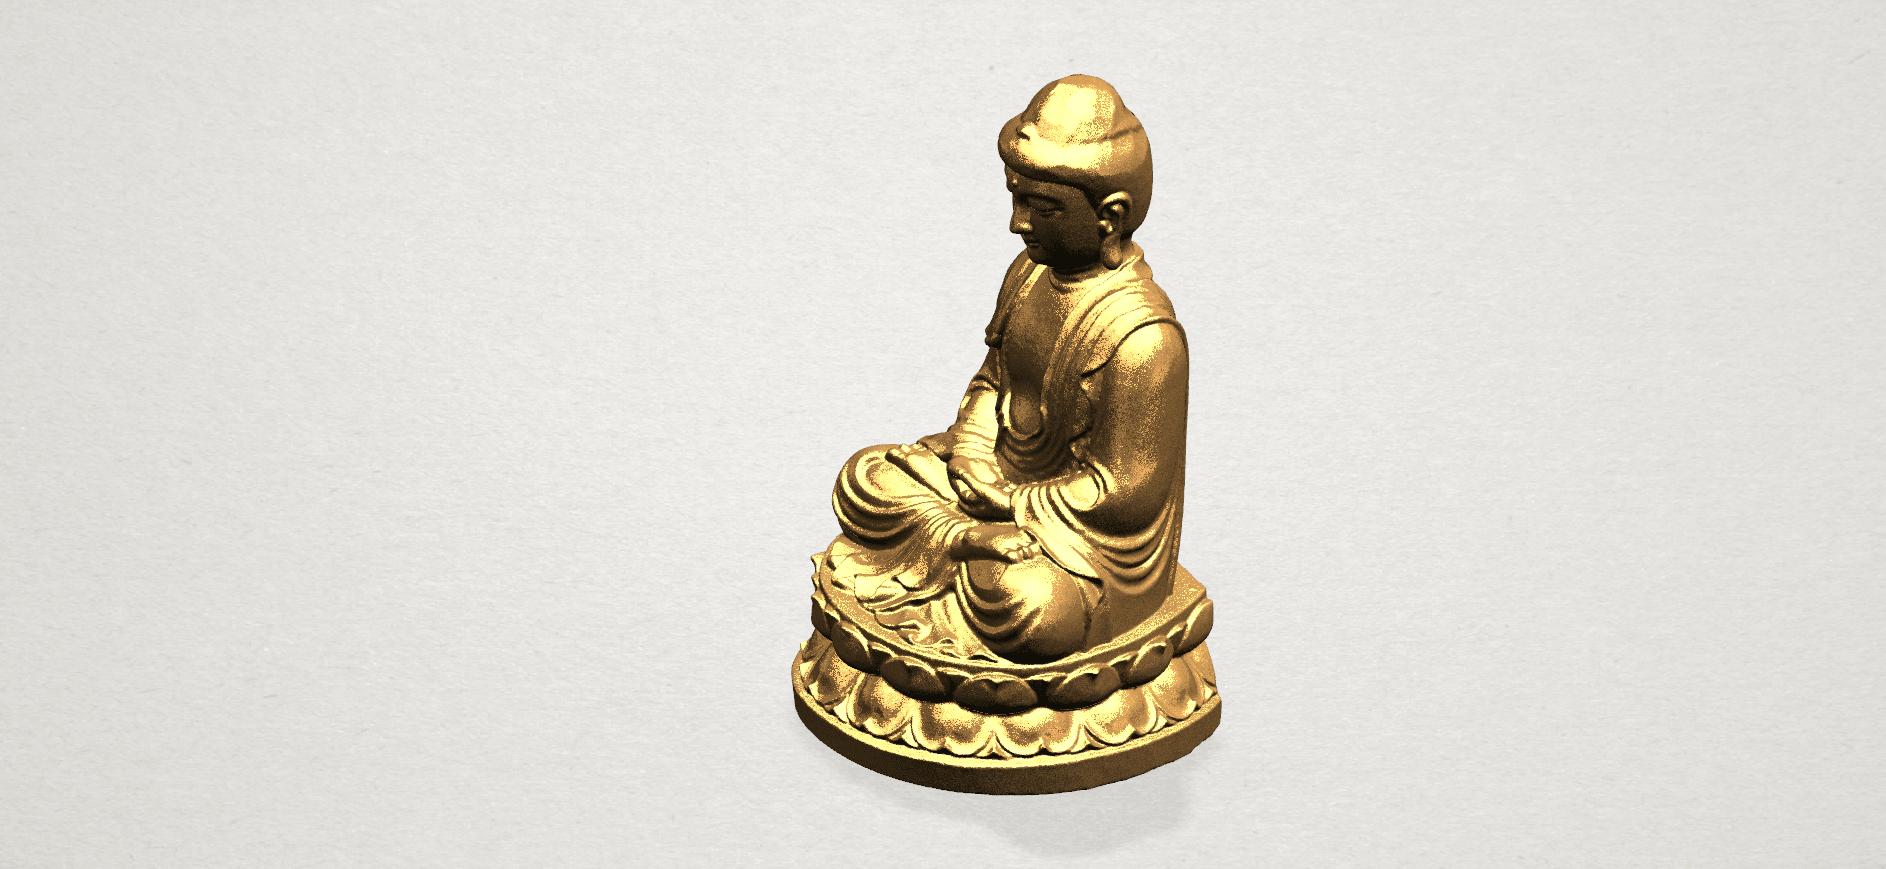 Gautama Buddha young - C05.png Télécharger fichier STL gratuit Gautama Bouddha Bouddha • Objet imprimable en 3D, GeorgesNikkei